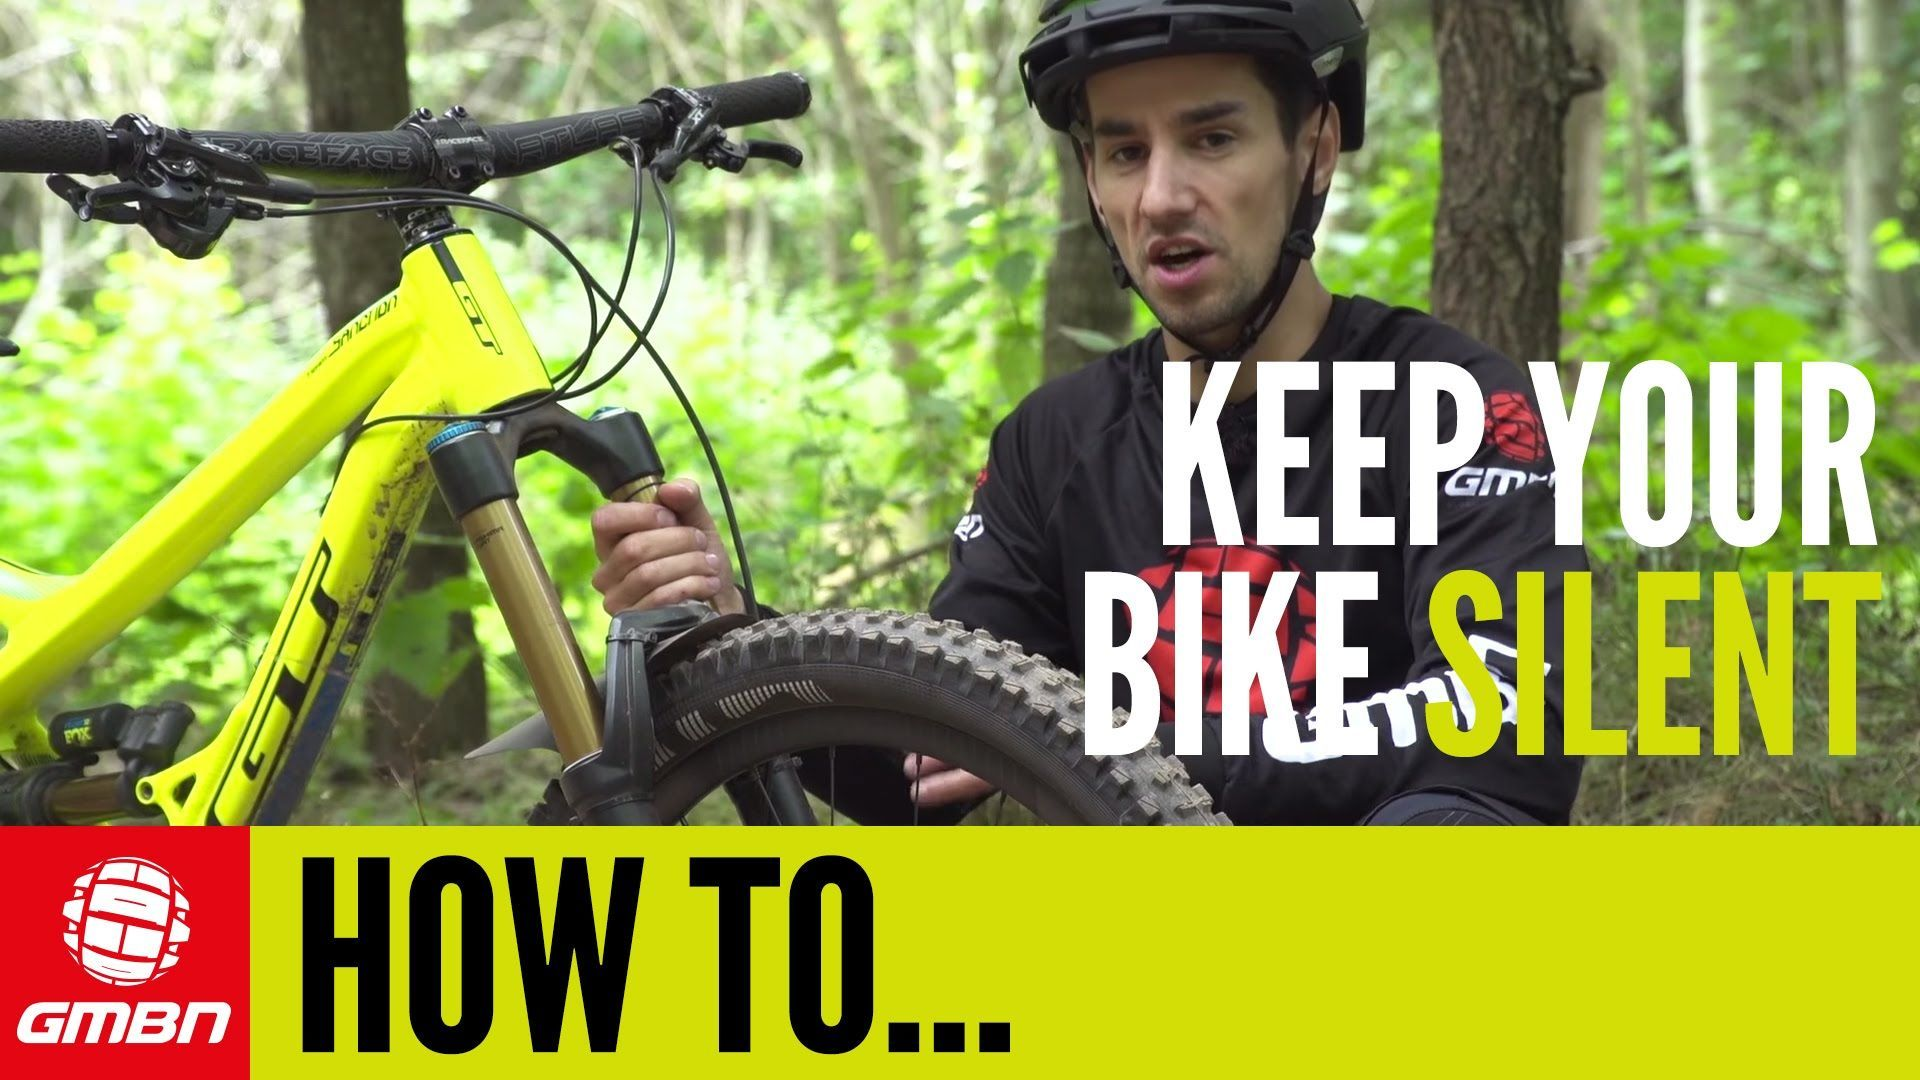 How To Keep Your Bike Smooth Silence Those Annoying Creaks Hardtail Mountain Bike